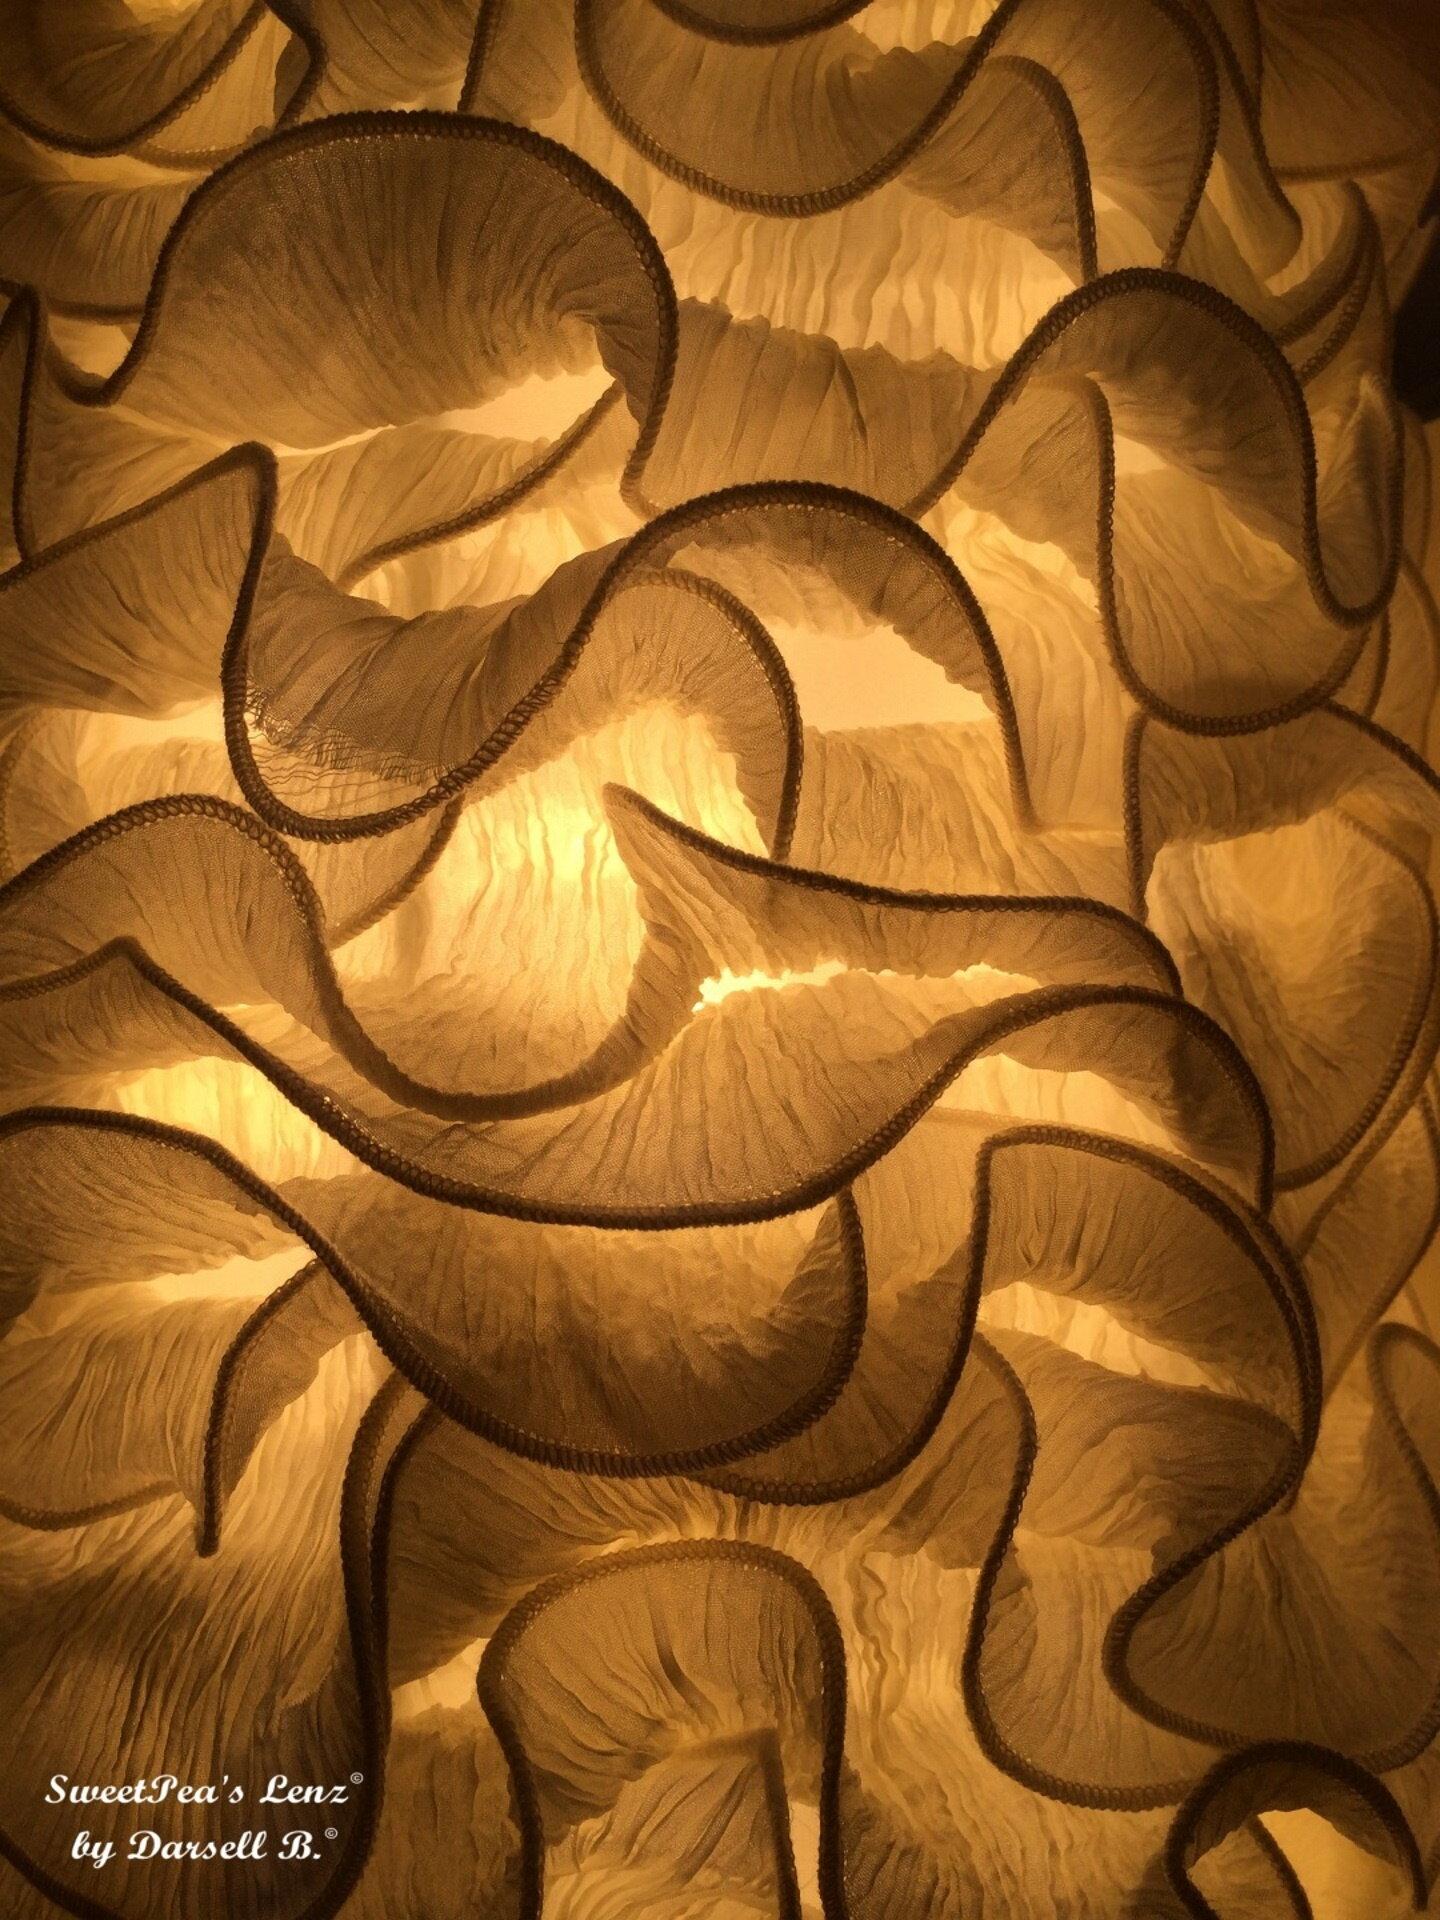 Darsell Brittingham SweetPeas Lenz by DarsellB - Golden Waves S2.JPG